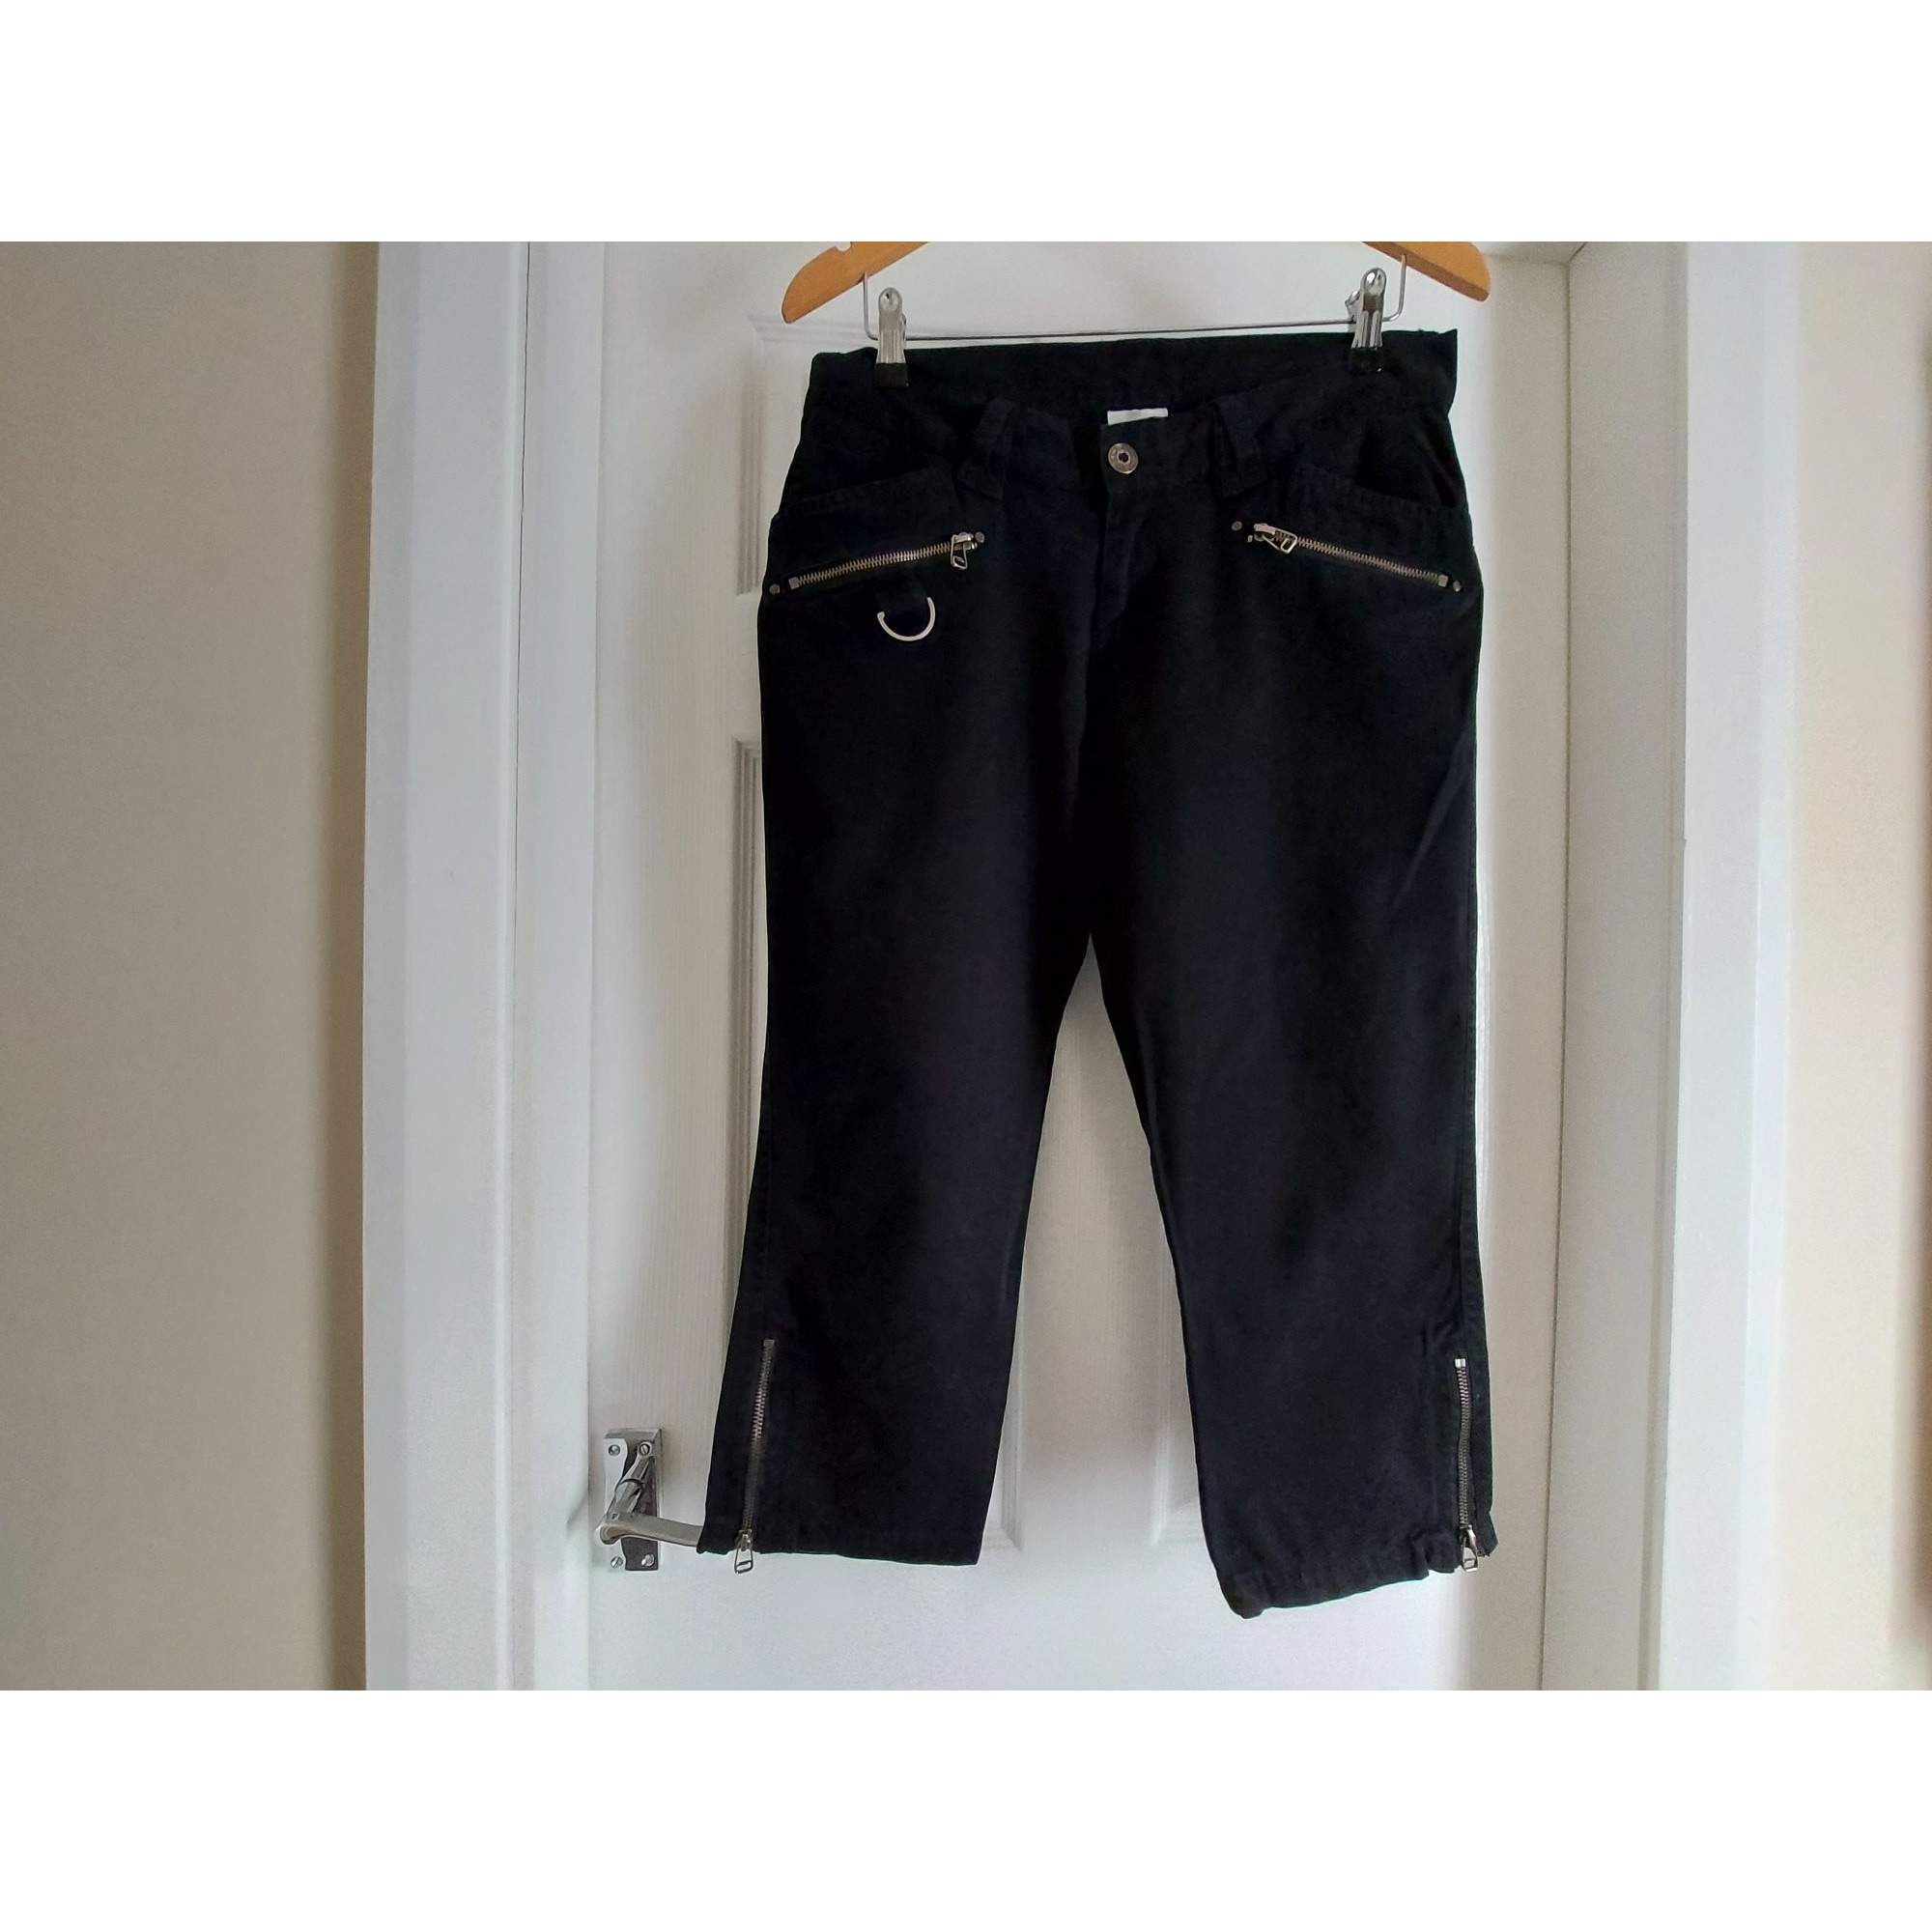 Cropped Pants, Capri Pants COLOURS OF THE WORLD Black